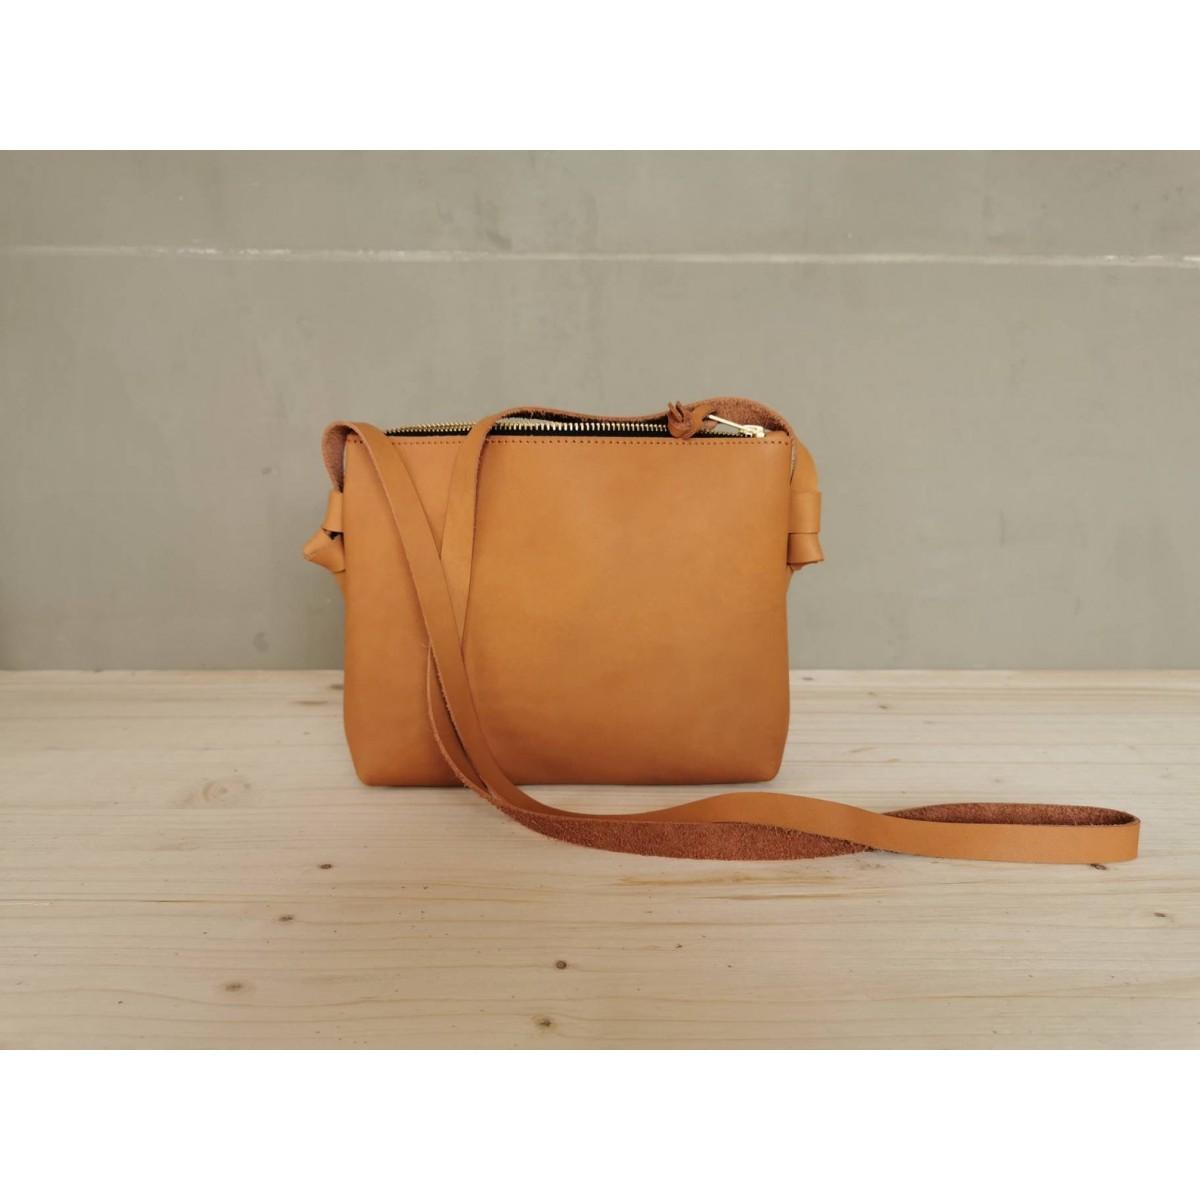 BSAITE / Kleine Crossbody Tasche / Festival Bag / Leder Umhängetasche